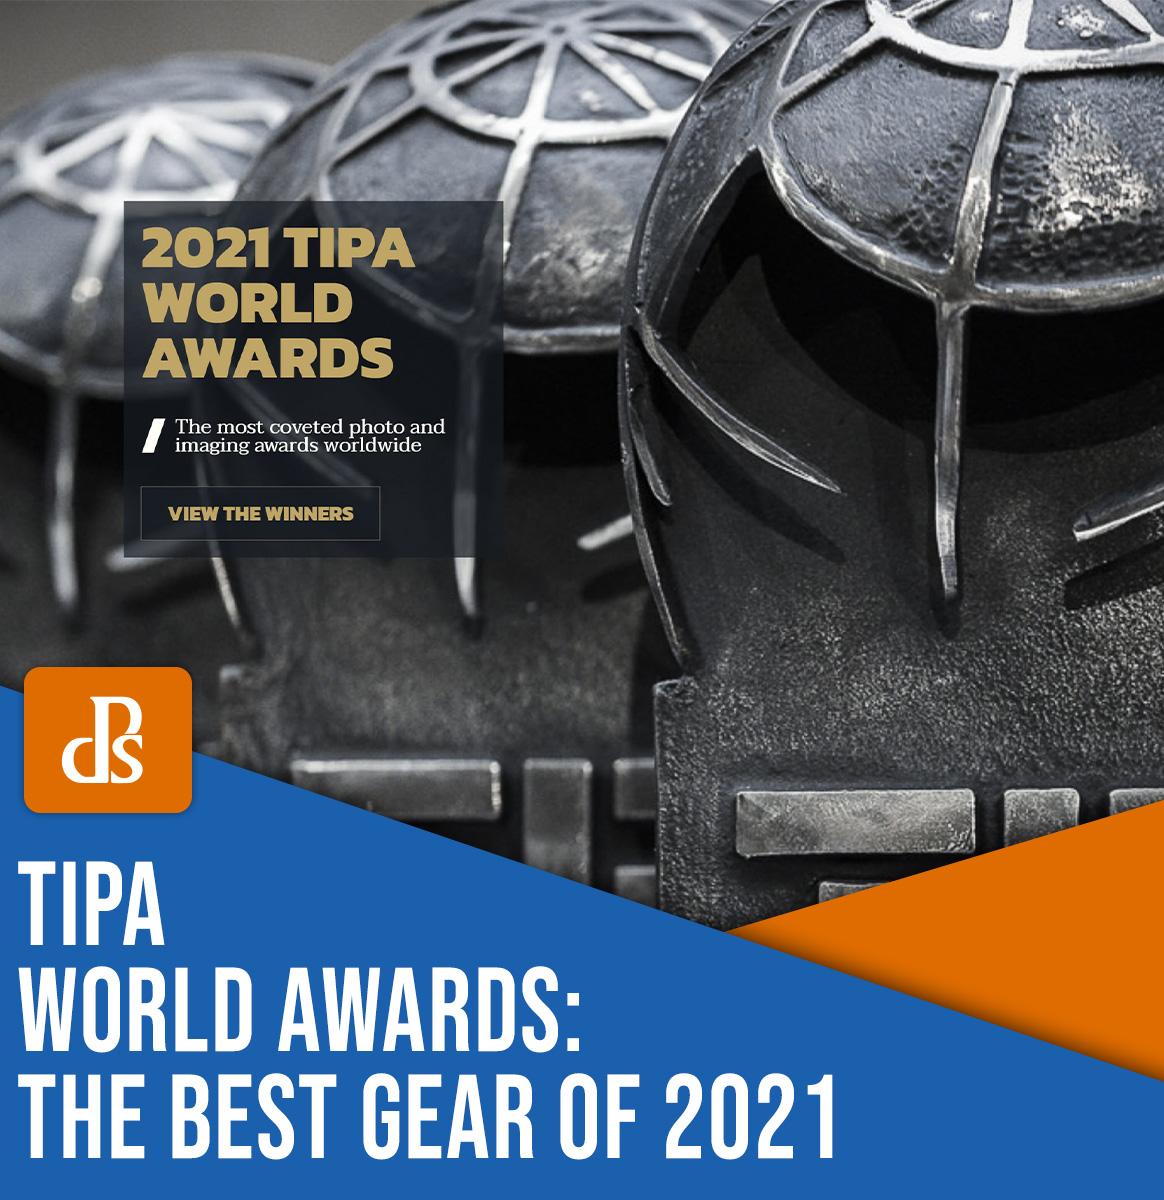 2021 TIPA World Awards